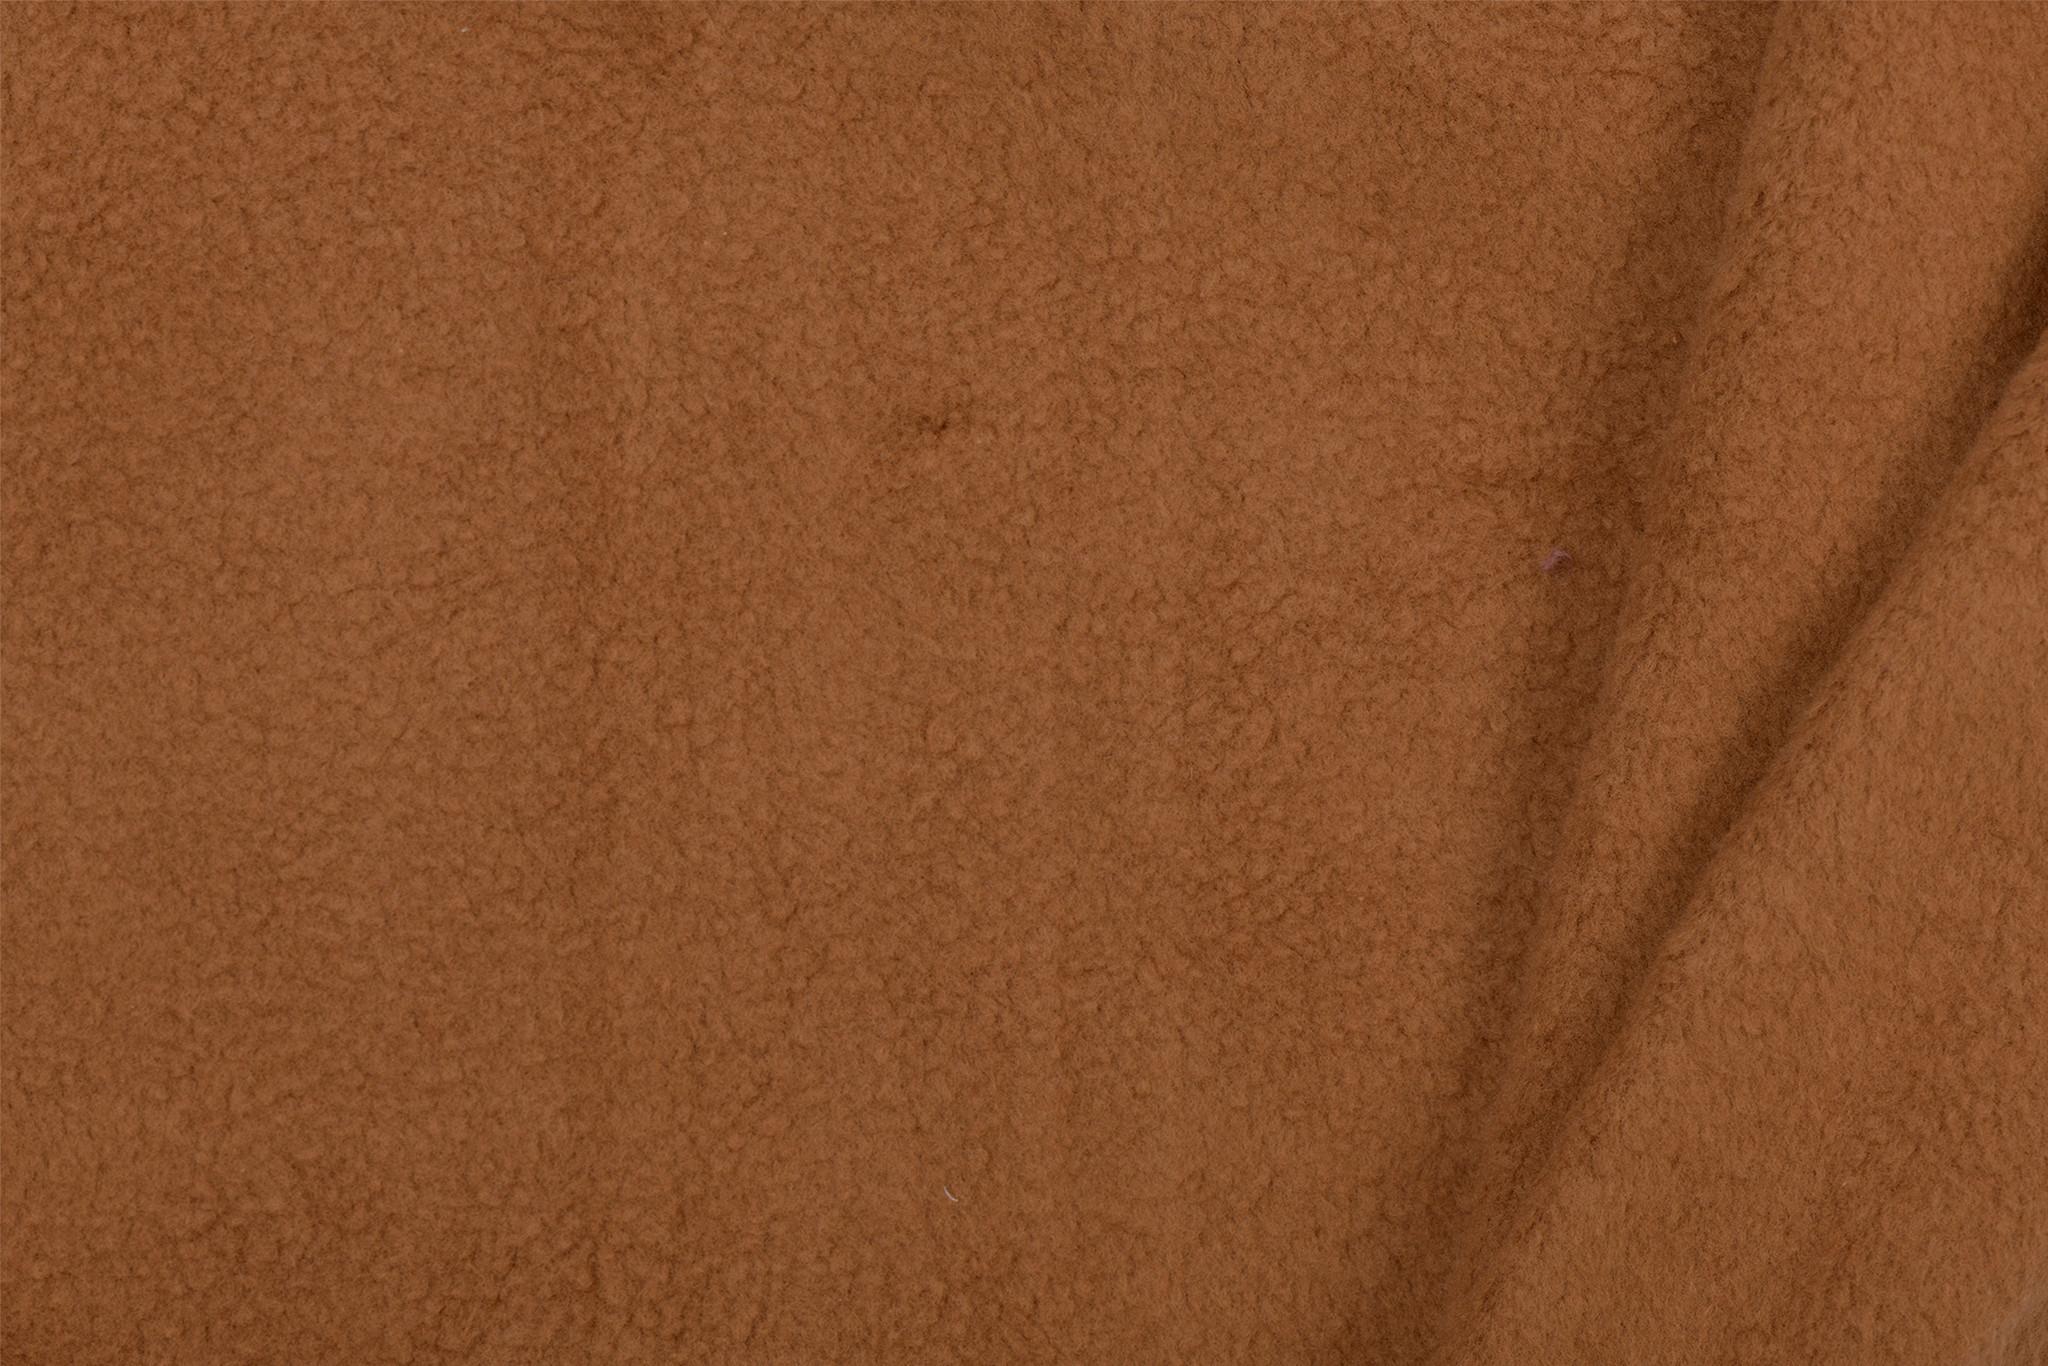 Fleece Katoen Camel